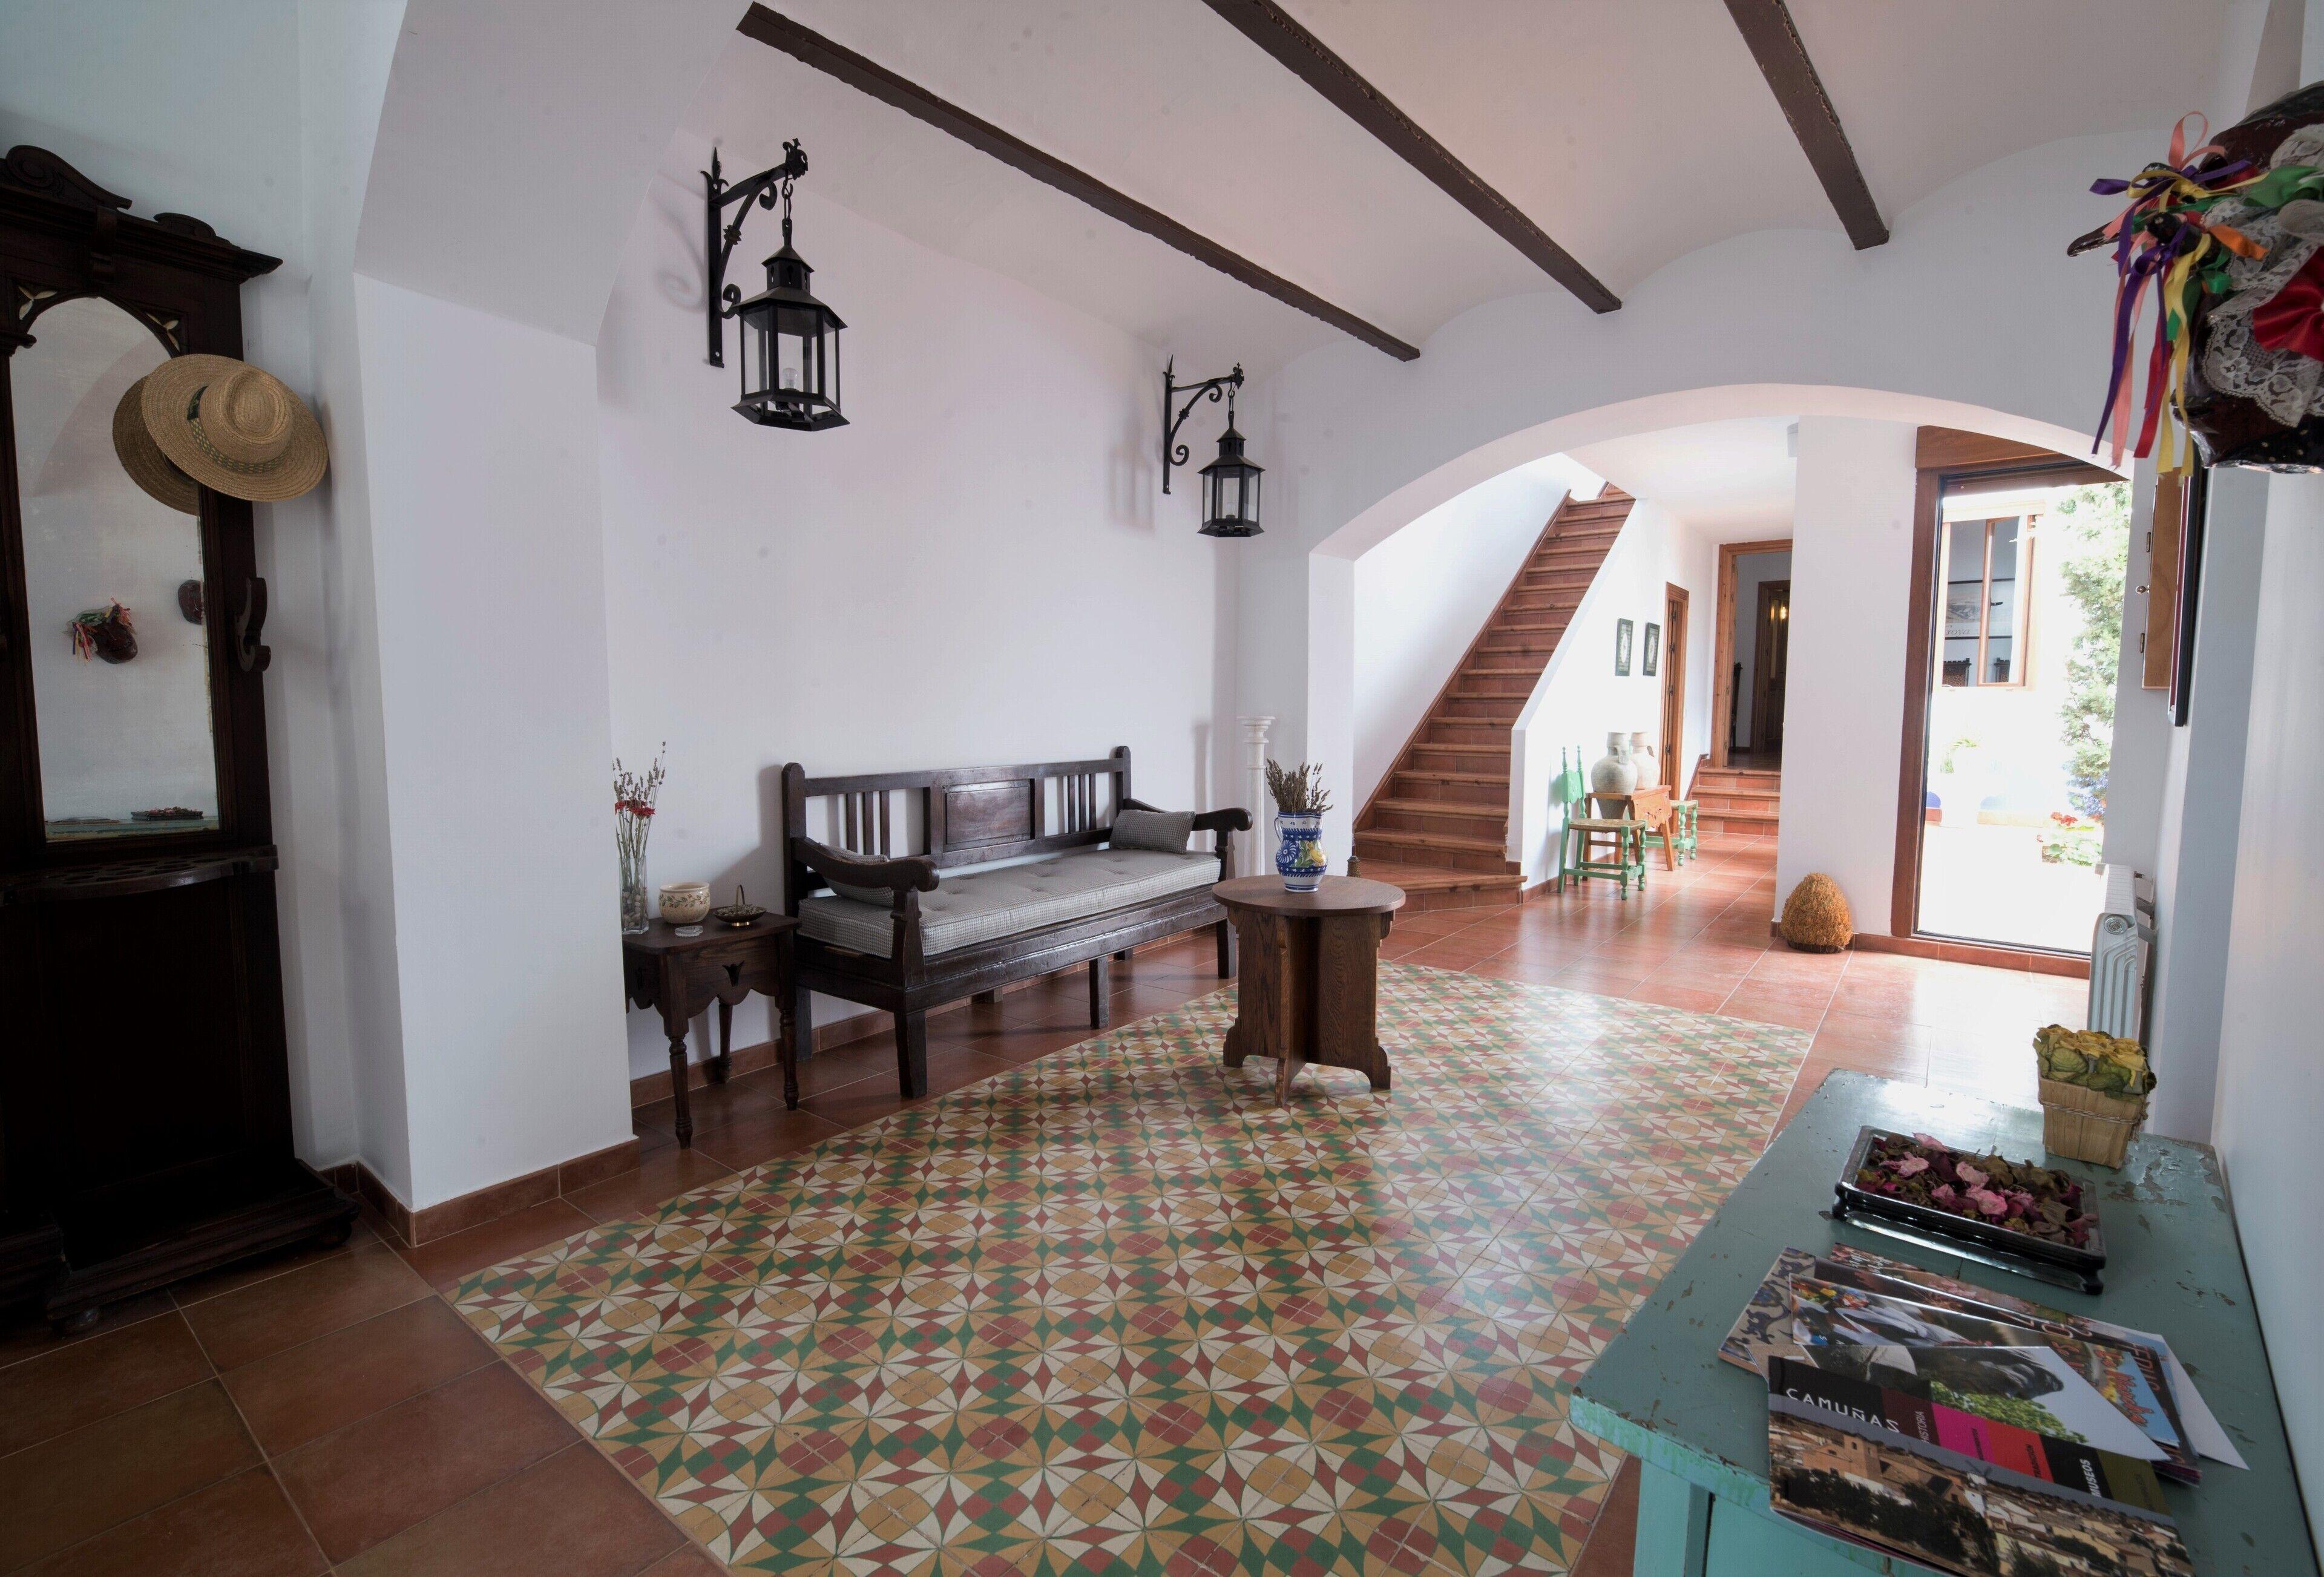 Casa Besana Is An Old Farmhouse Renovated In La Mancha Toledana Camunas Hotelbewertungen 2020 Expedia De